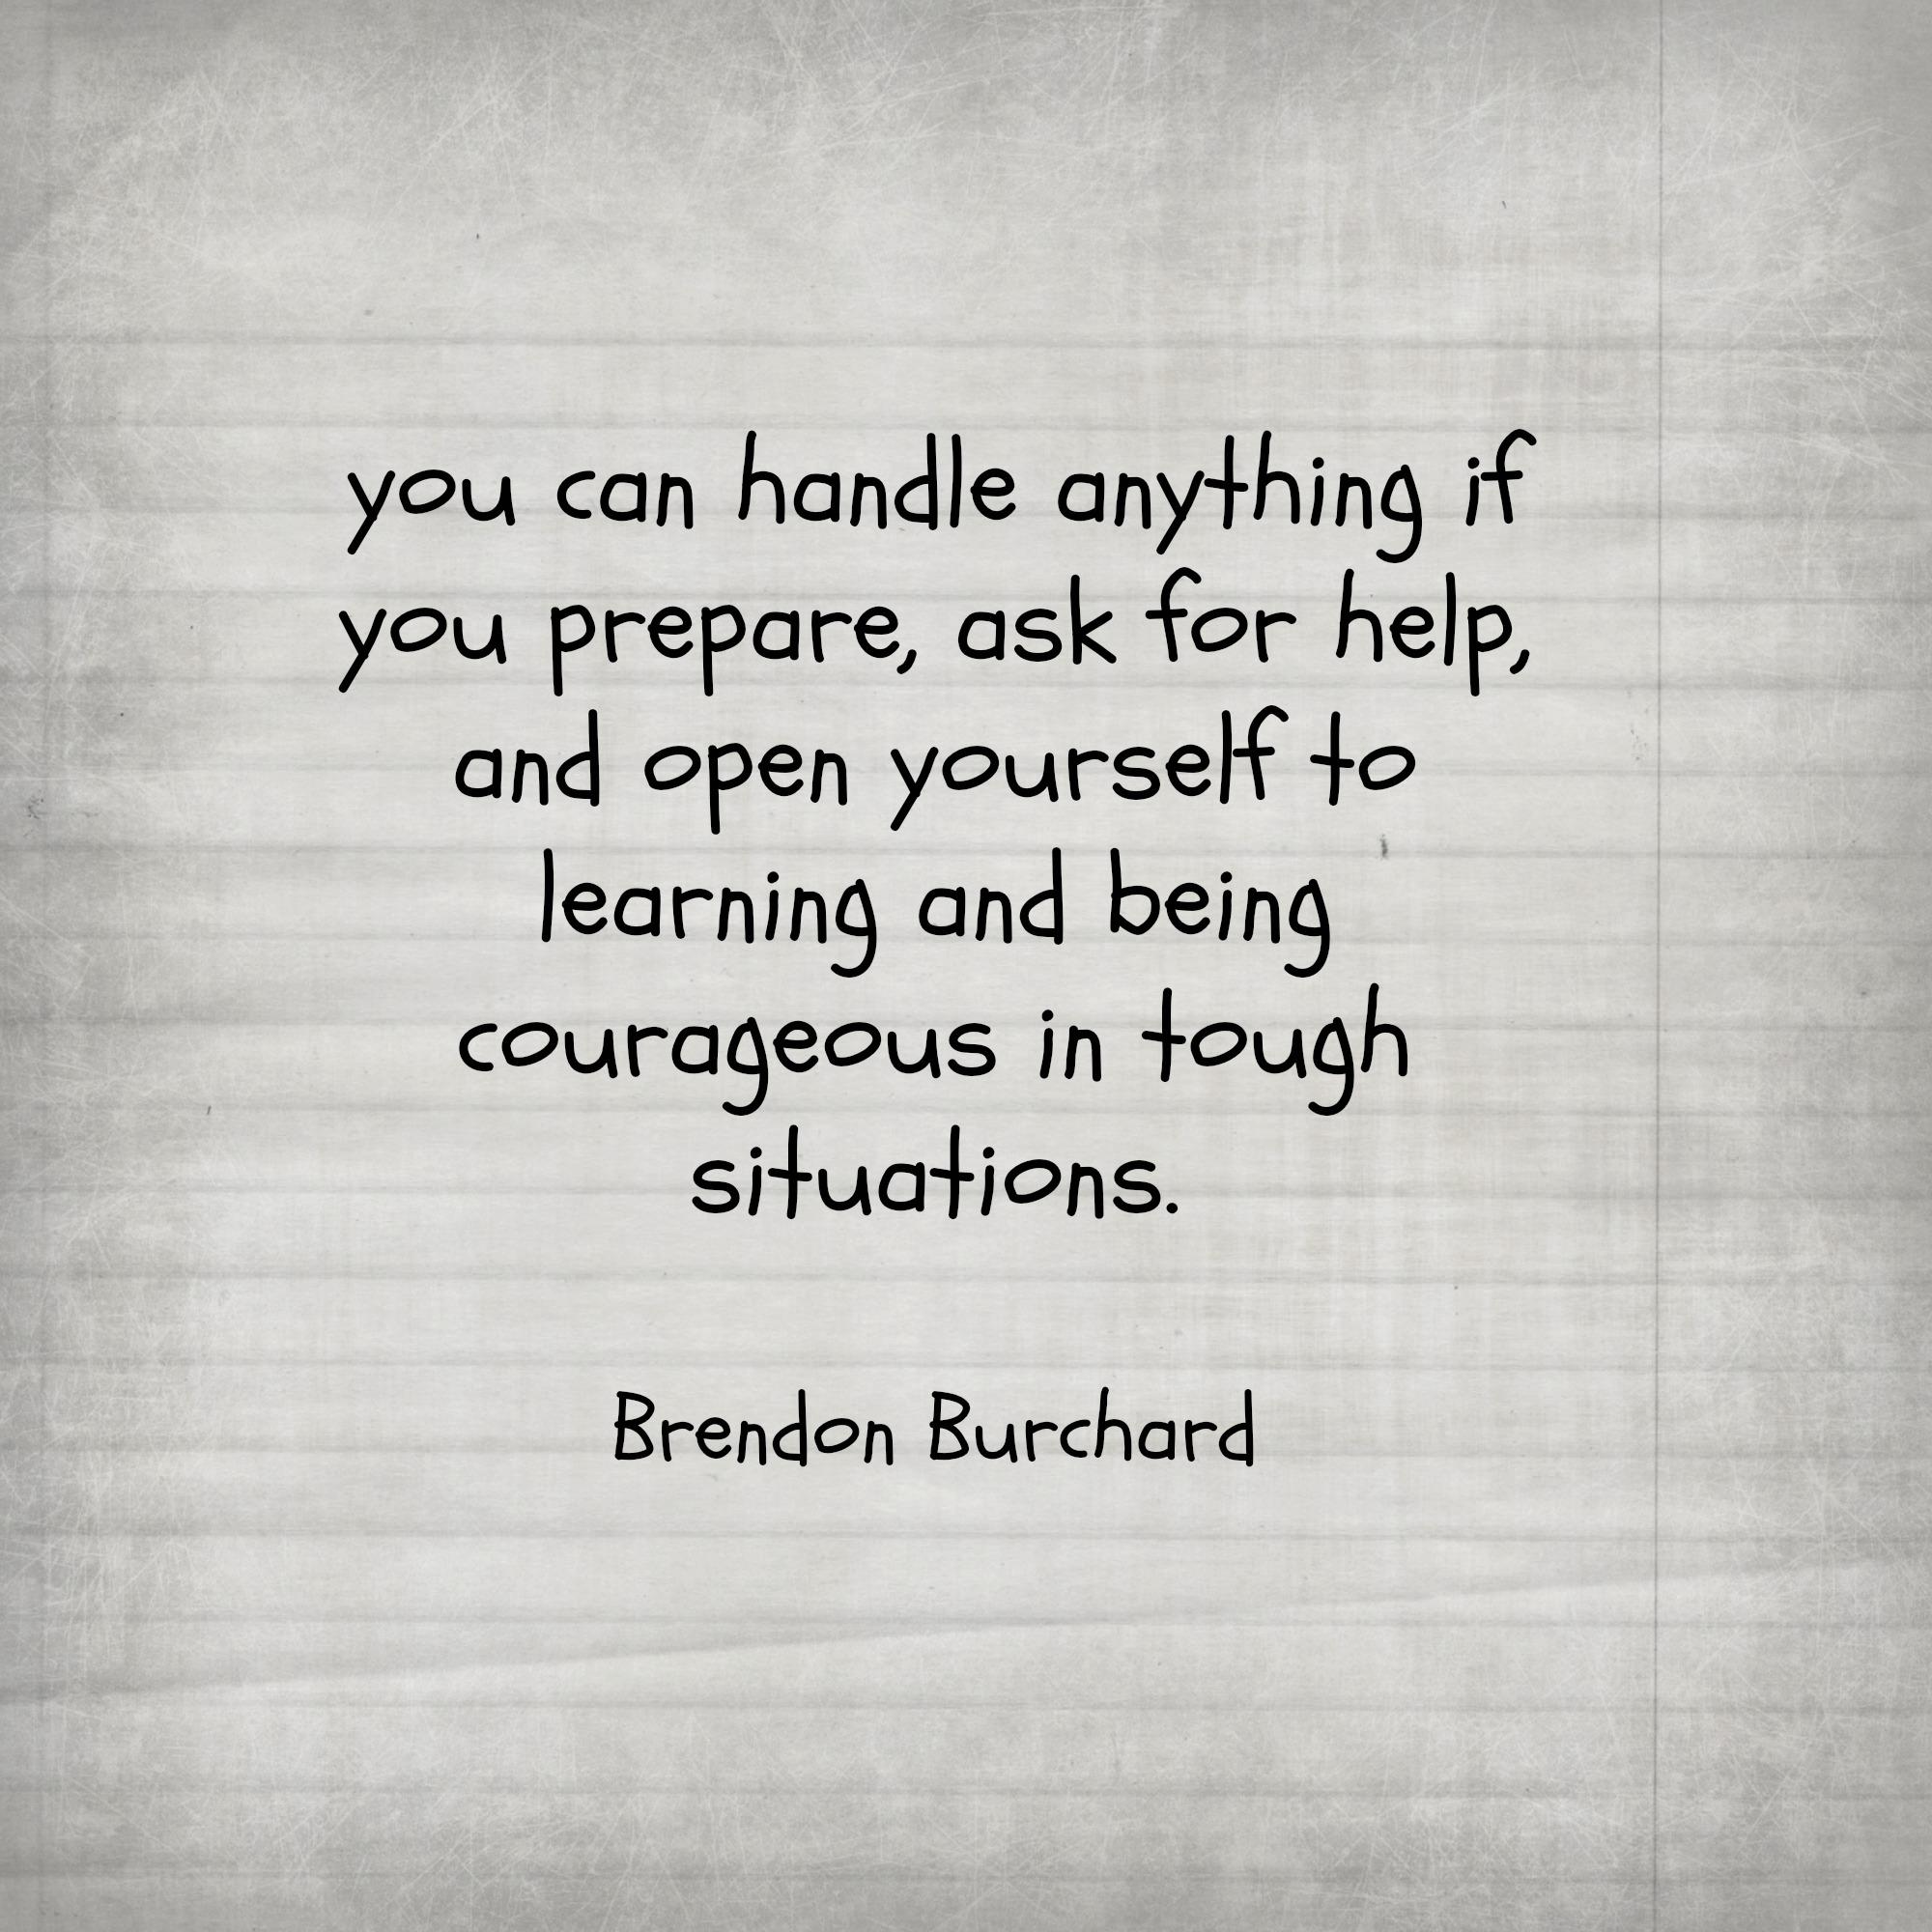 youcanhandleit-BrendonBurchard-InspirationalQuotes